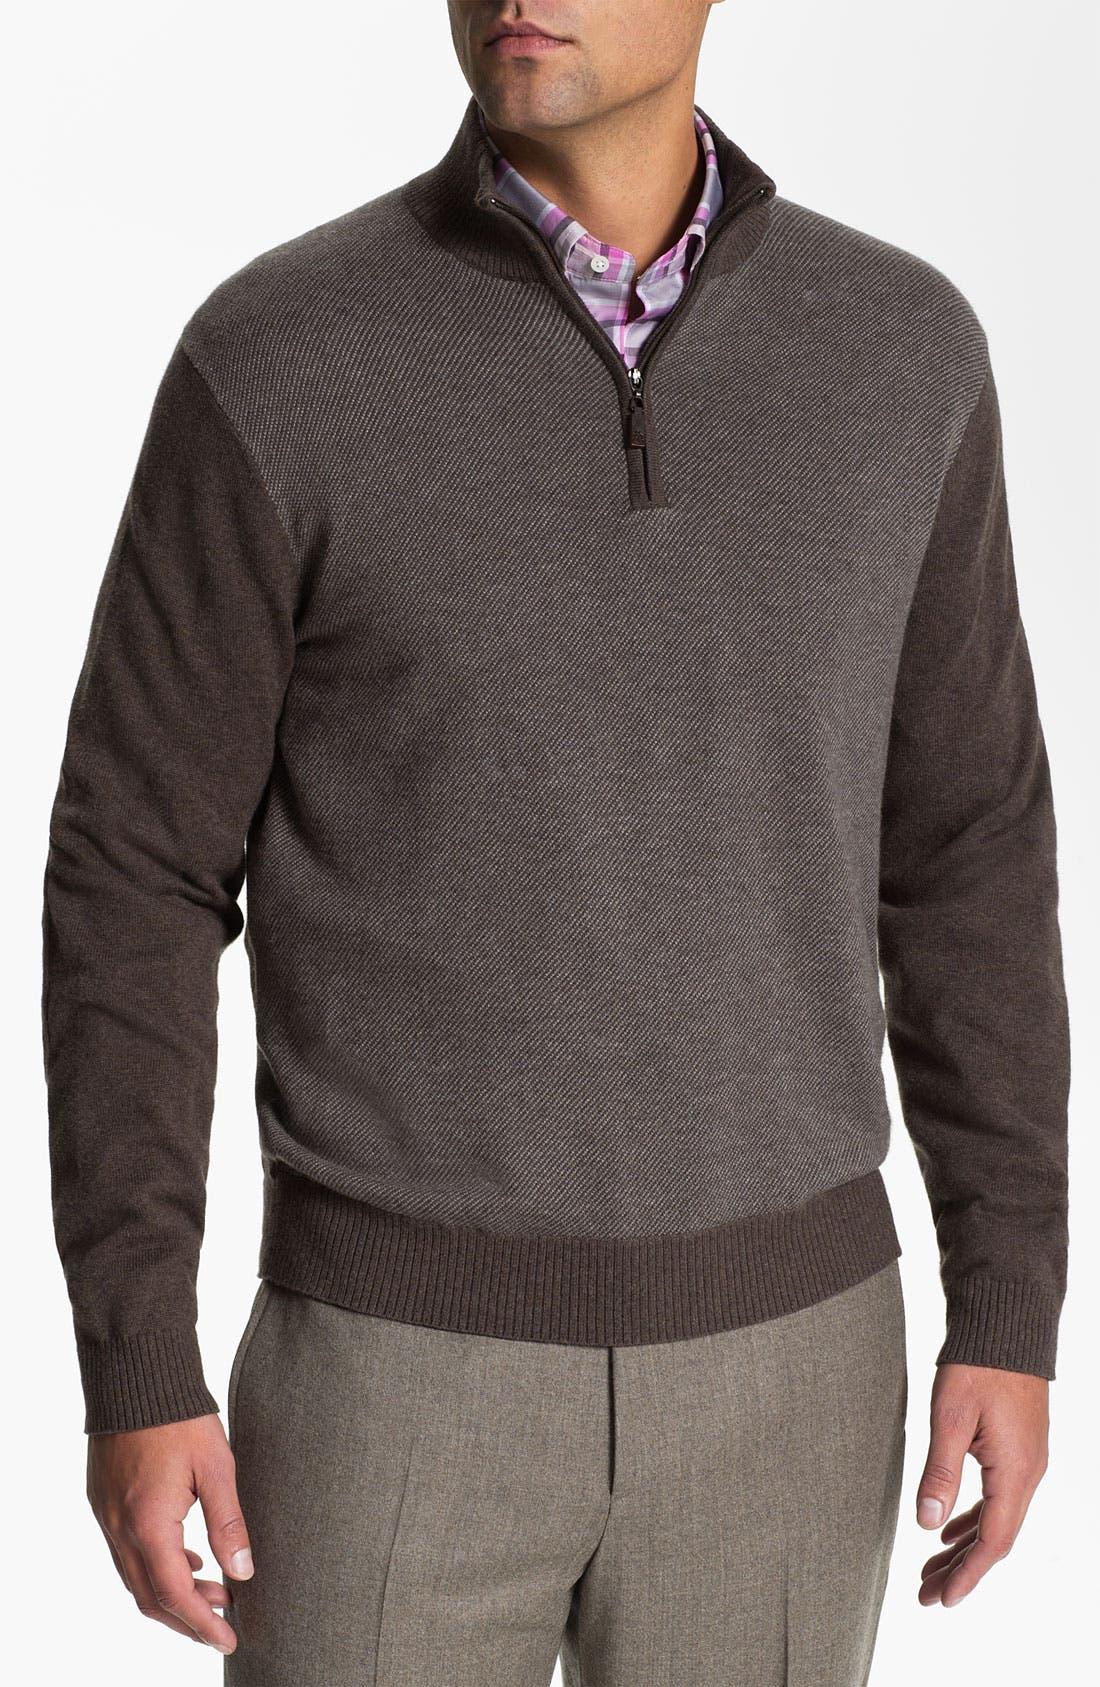 Alternate Image 1 Selected - Robert Talbott Quarter Zip Cotton & Cashmere Sweater